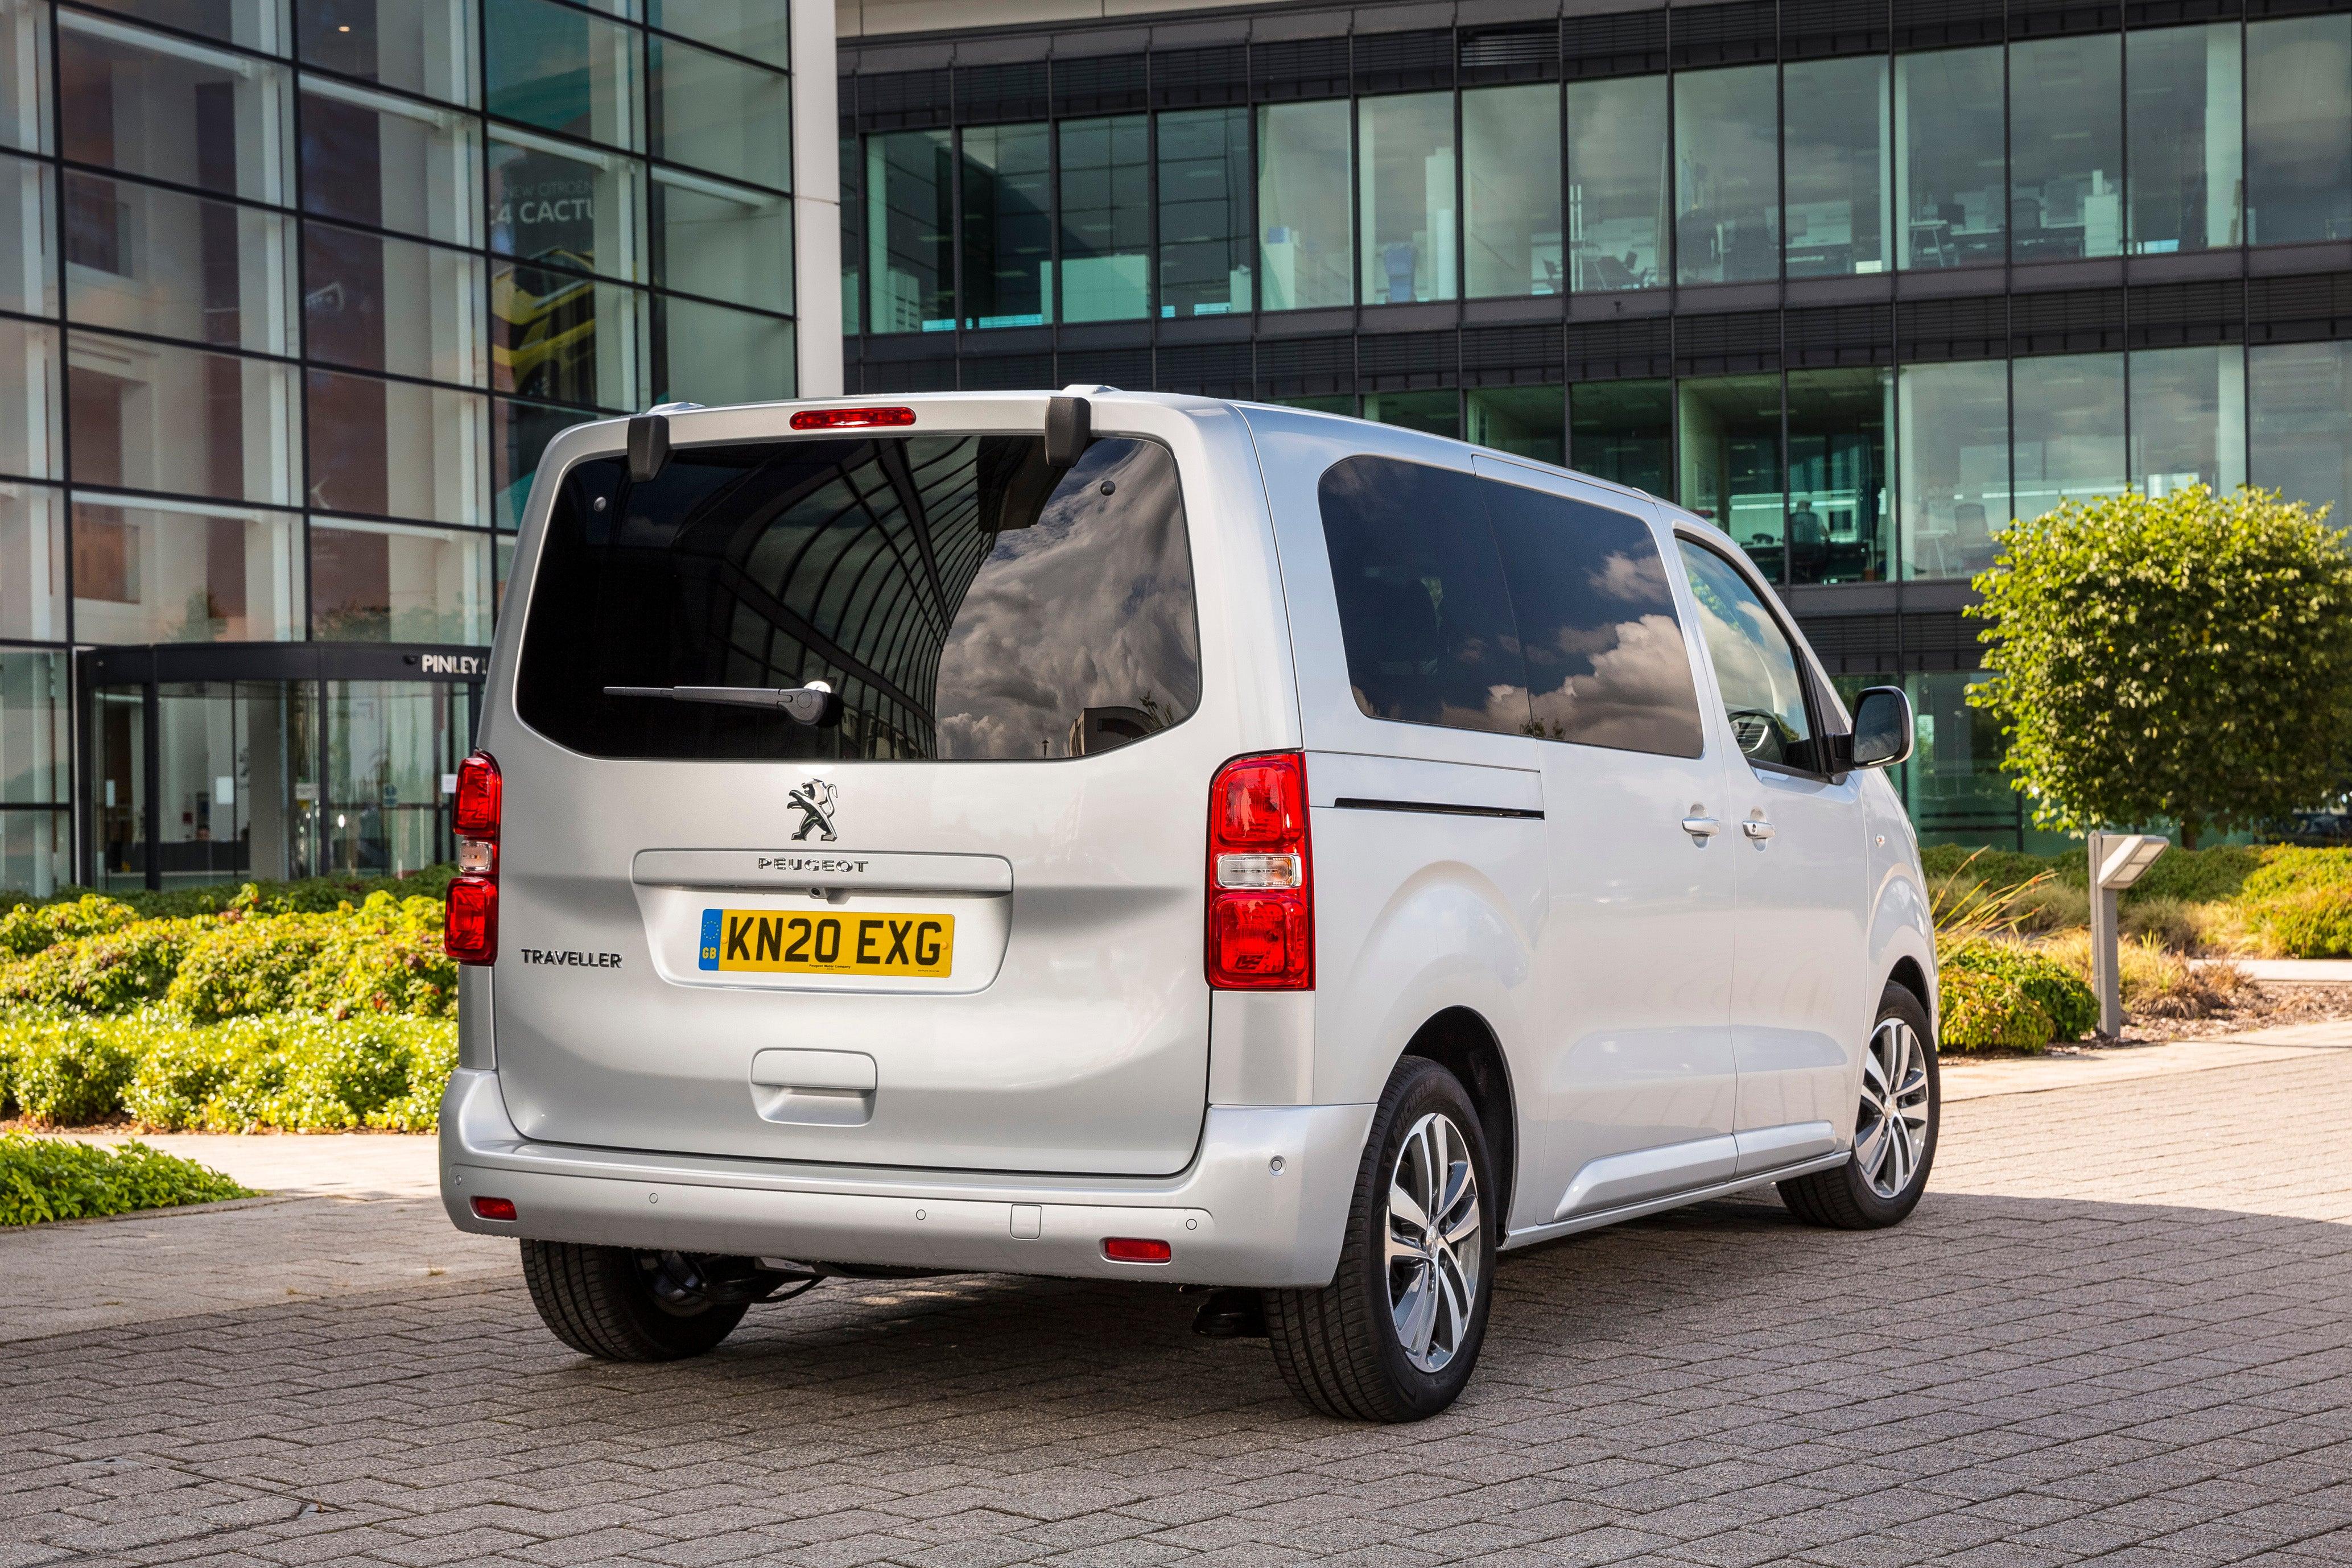 Peugeot Traveller Rear View